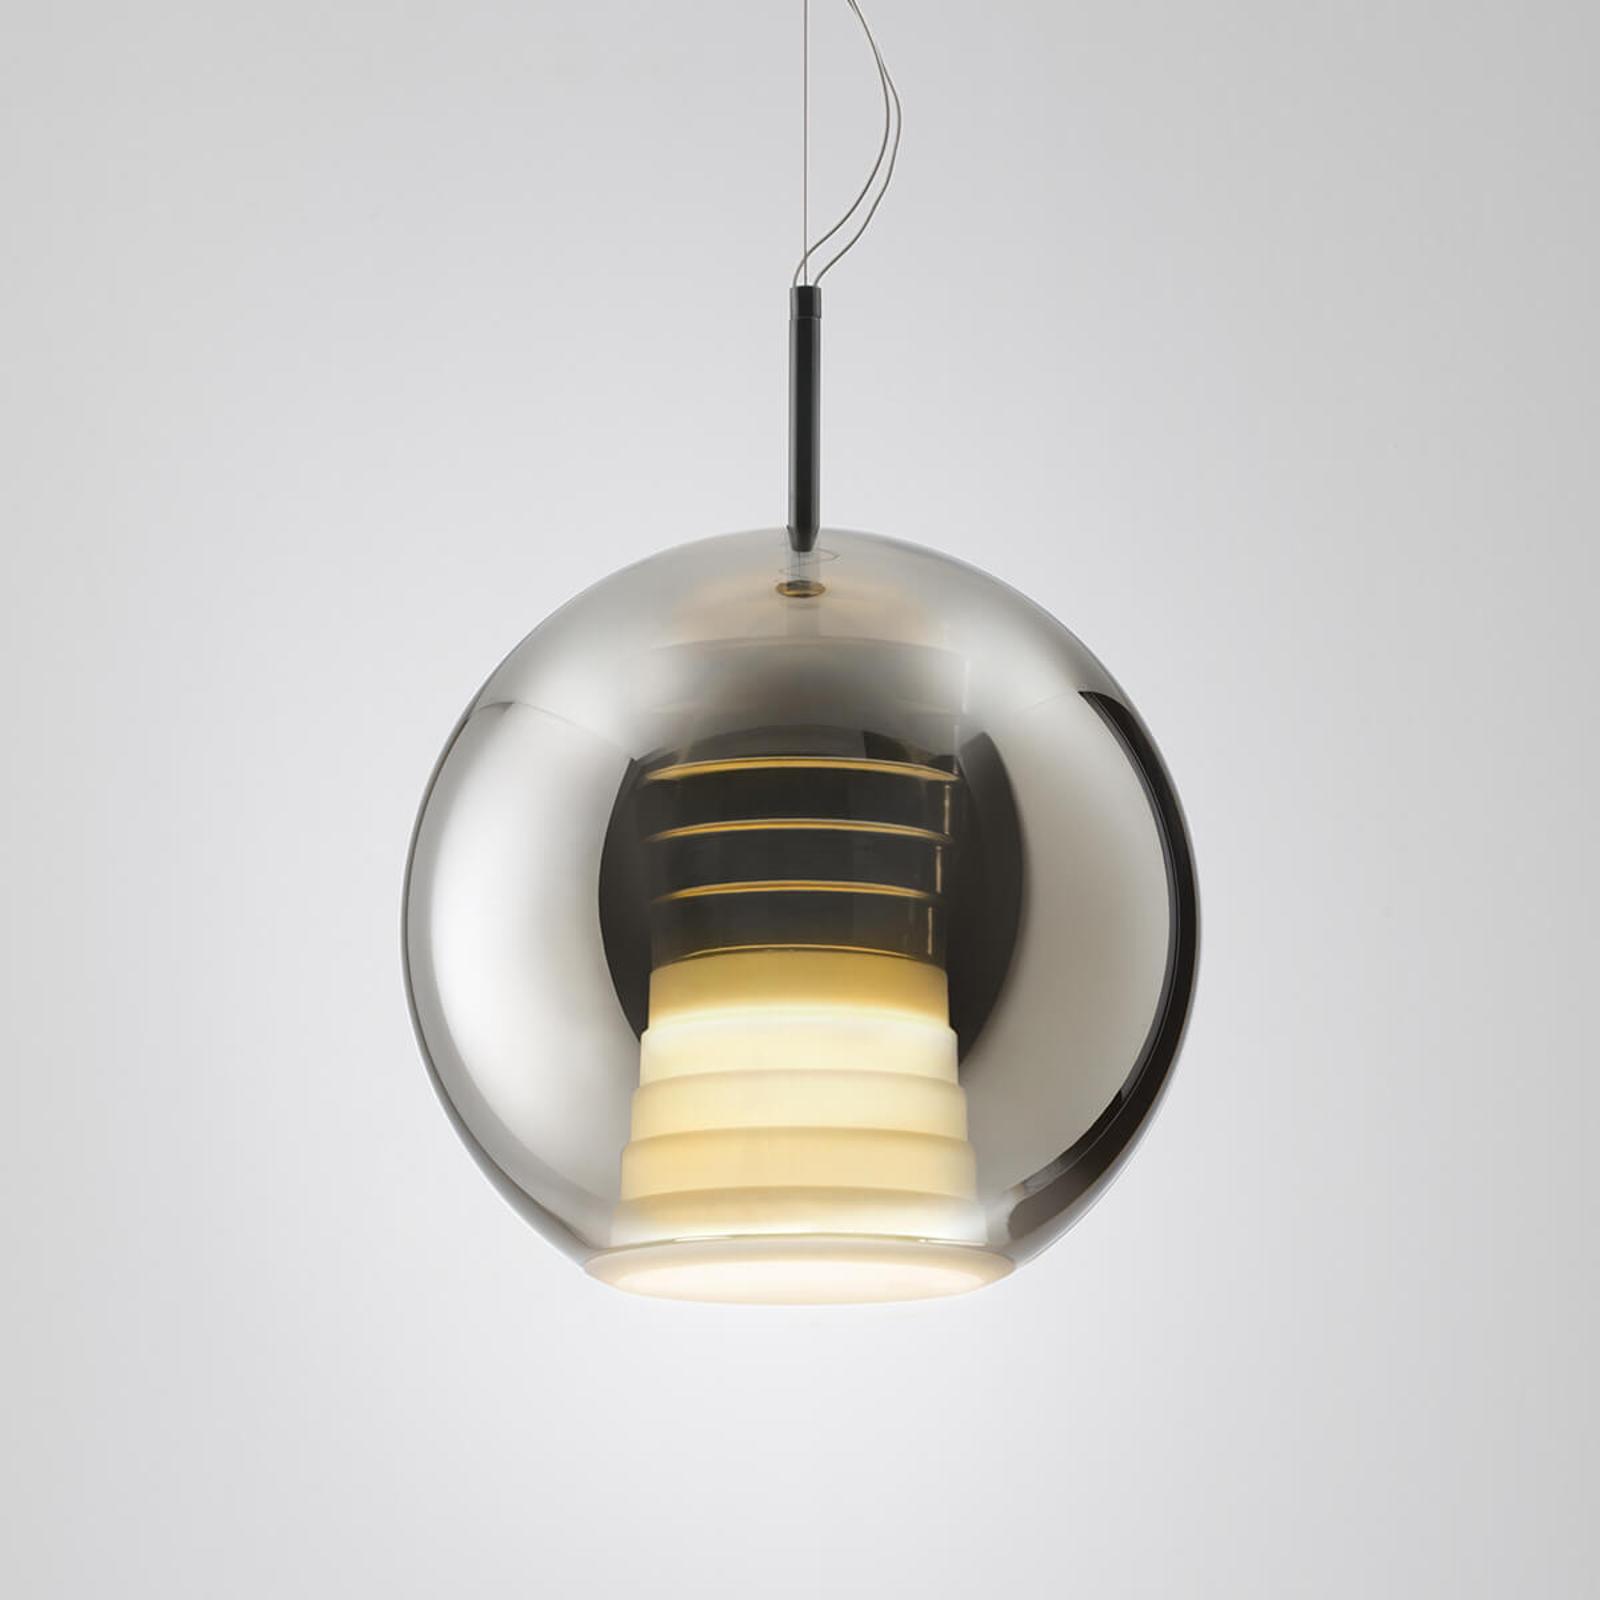 Fabbian Beluga Royal - LED-Hängeleuchte titan 30cm